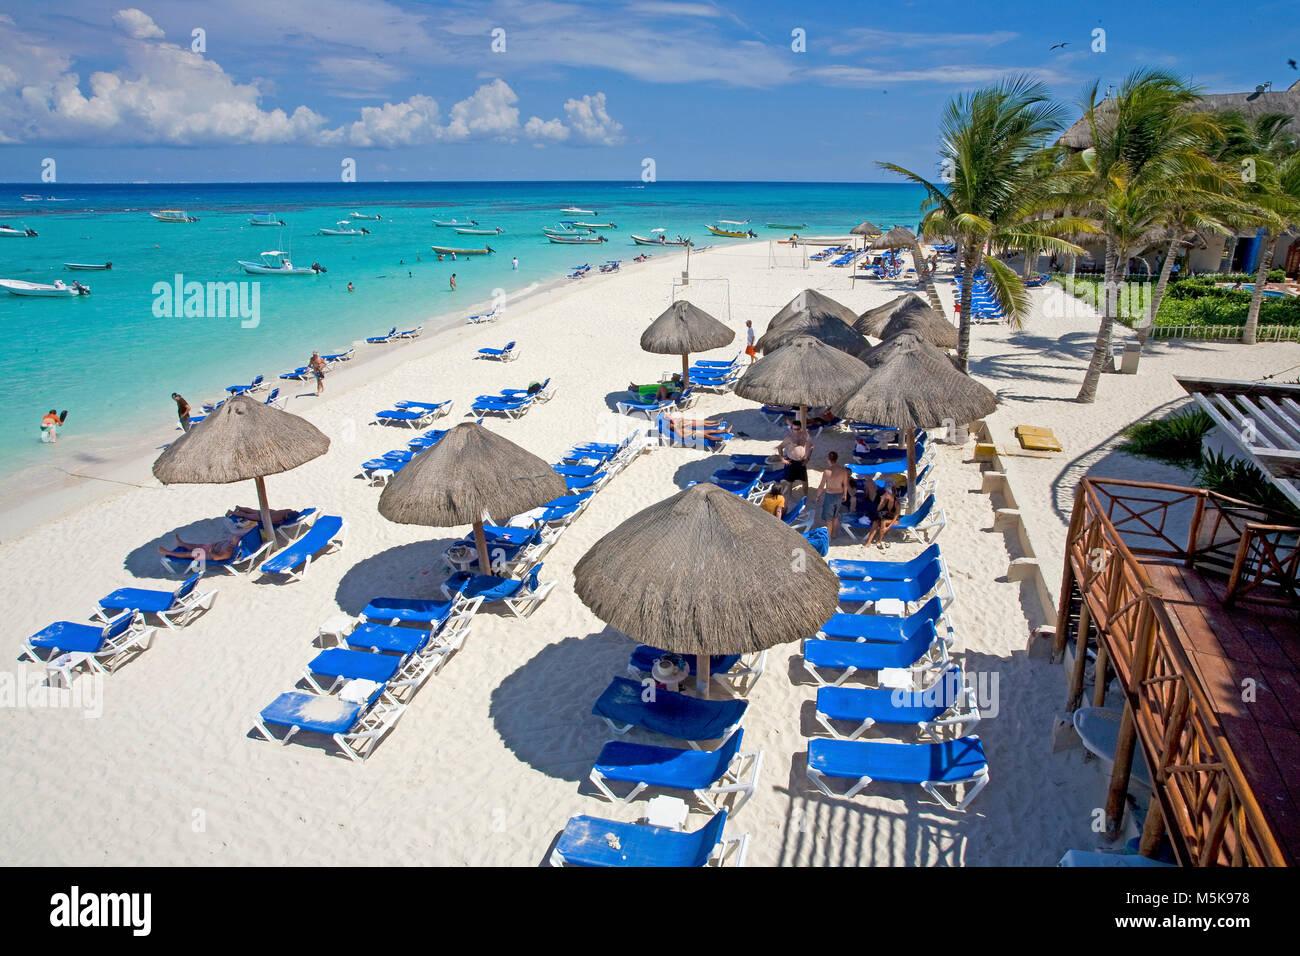 Strand von Playa del Carmen, Mexiko, Karibik | Strand von Playa del Carmen, Mexiko, Karibik Stockbild